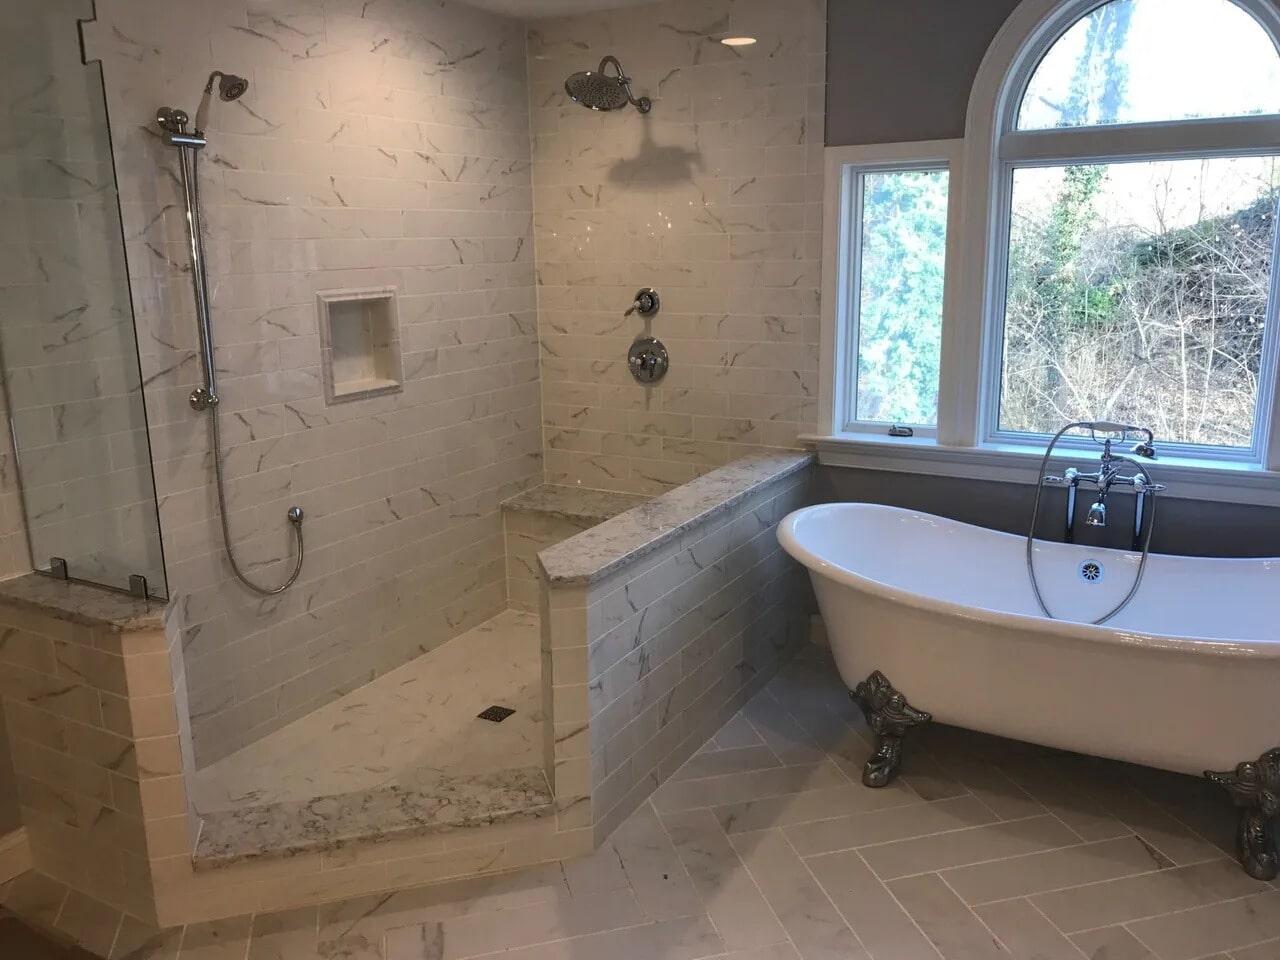 Bathroom tile in York, PA from Chuck Kraft Carpets